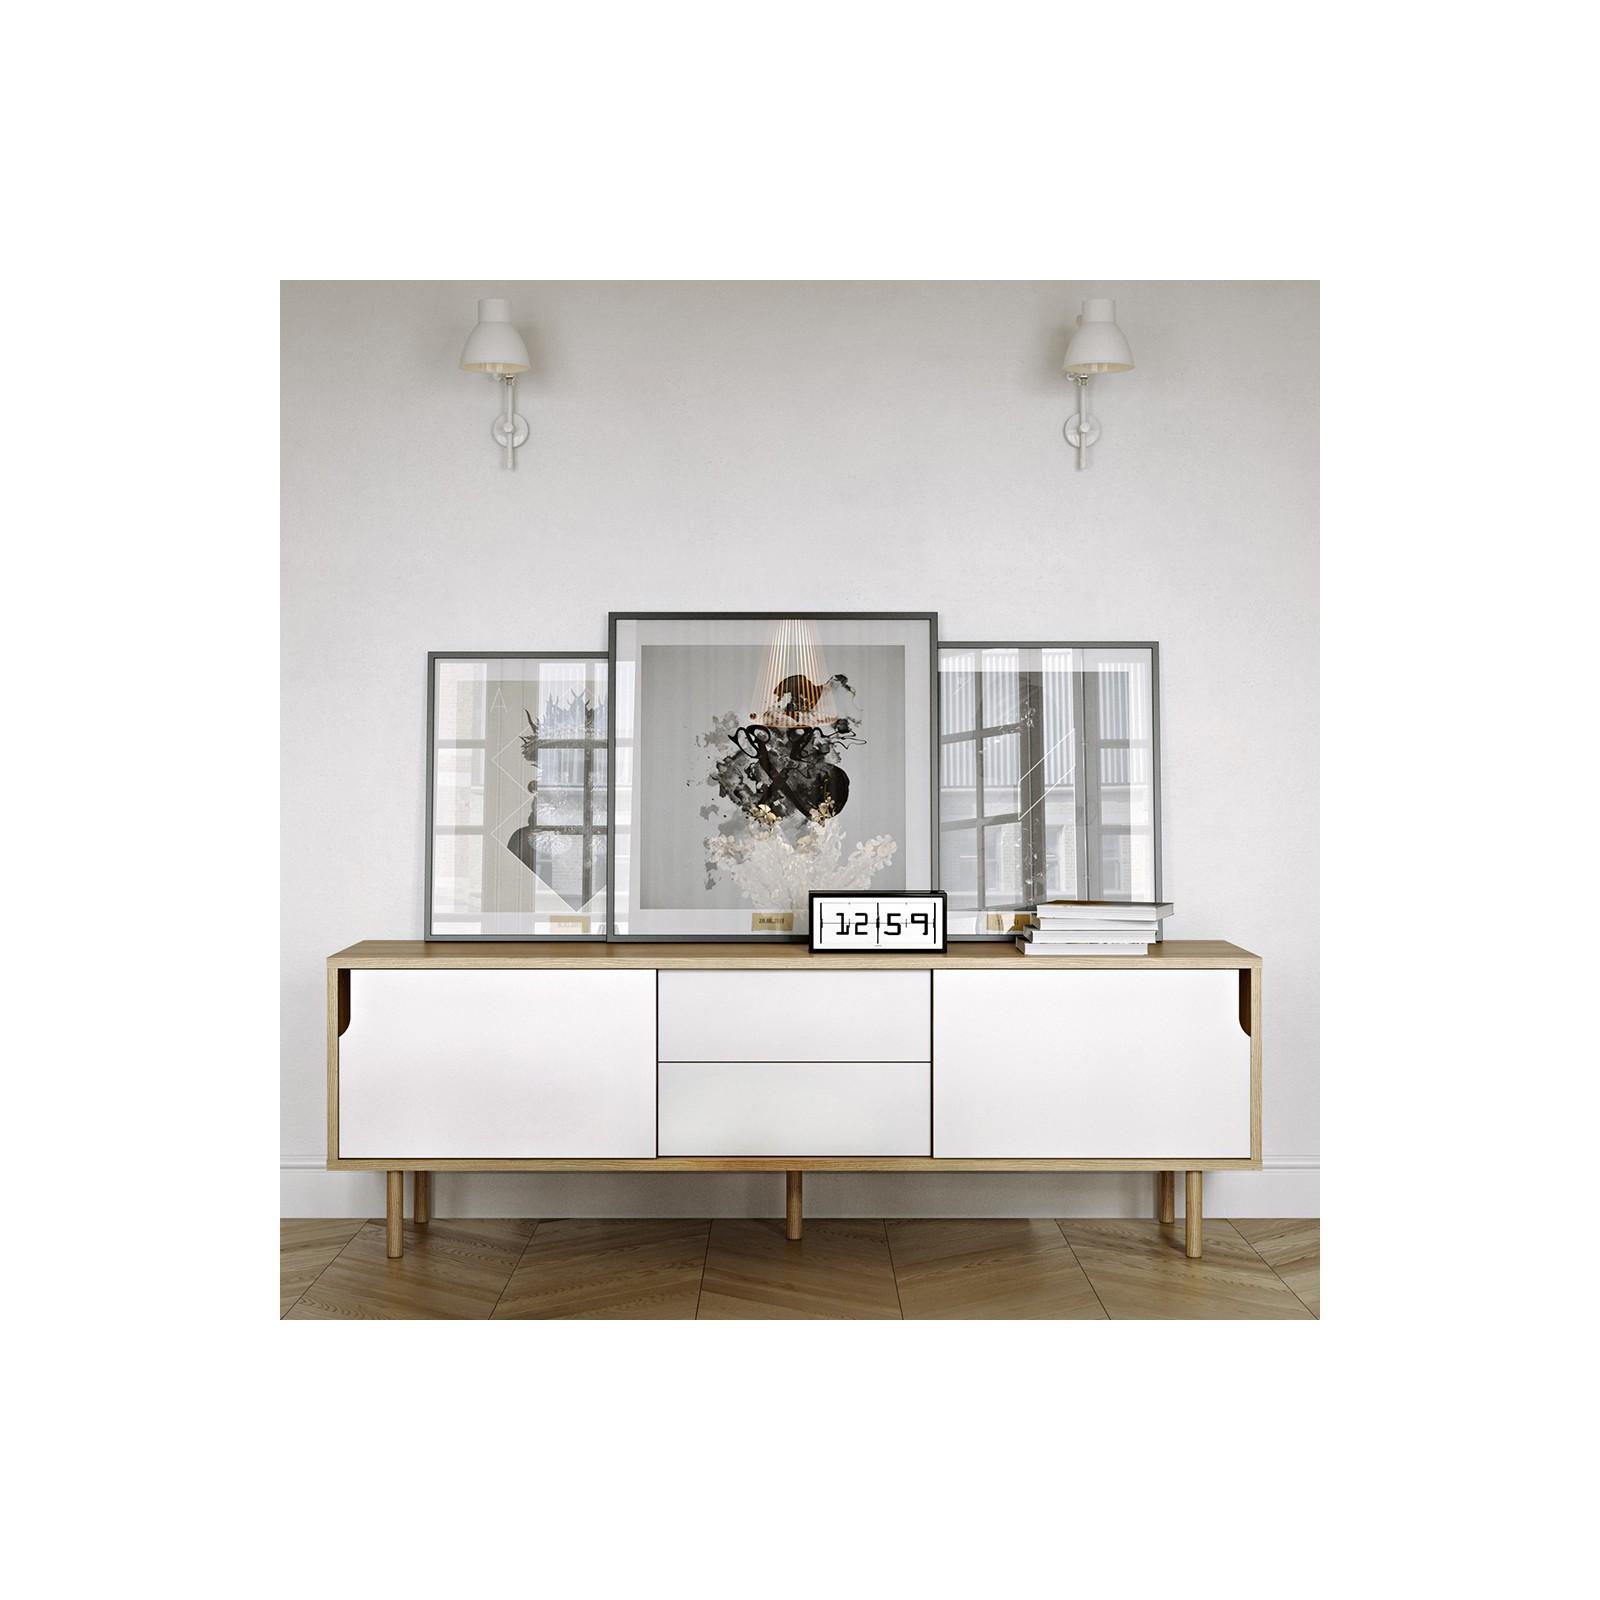 Meuble Tv Danois Blanc Et Bois Arne Concept # Meuble Tv Blanc Bois